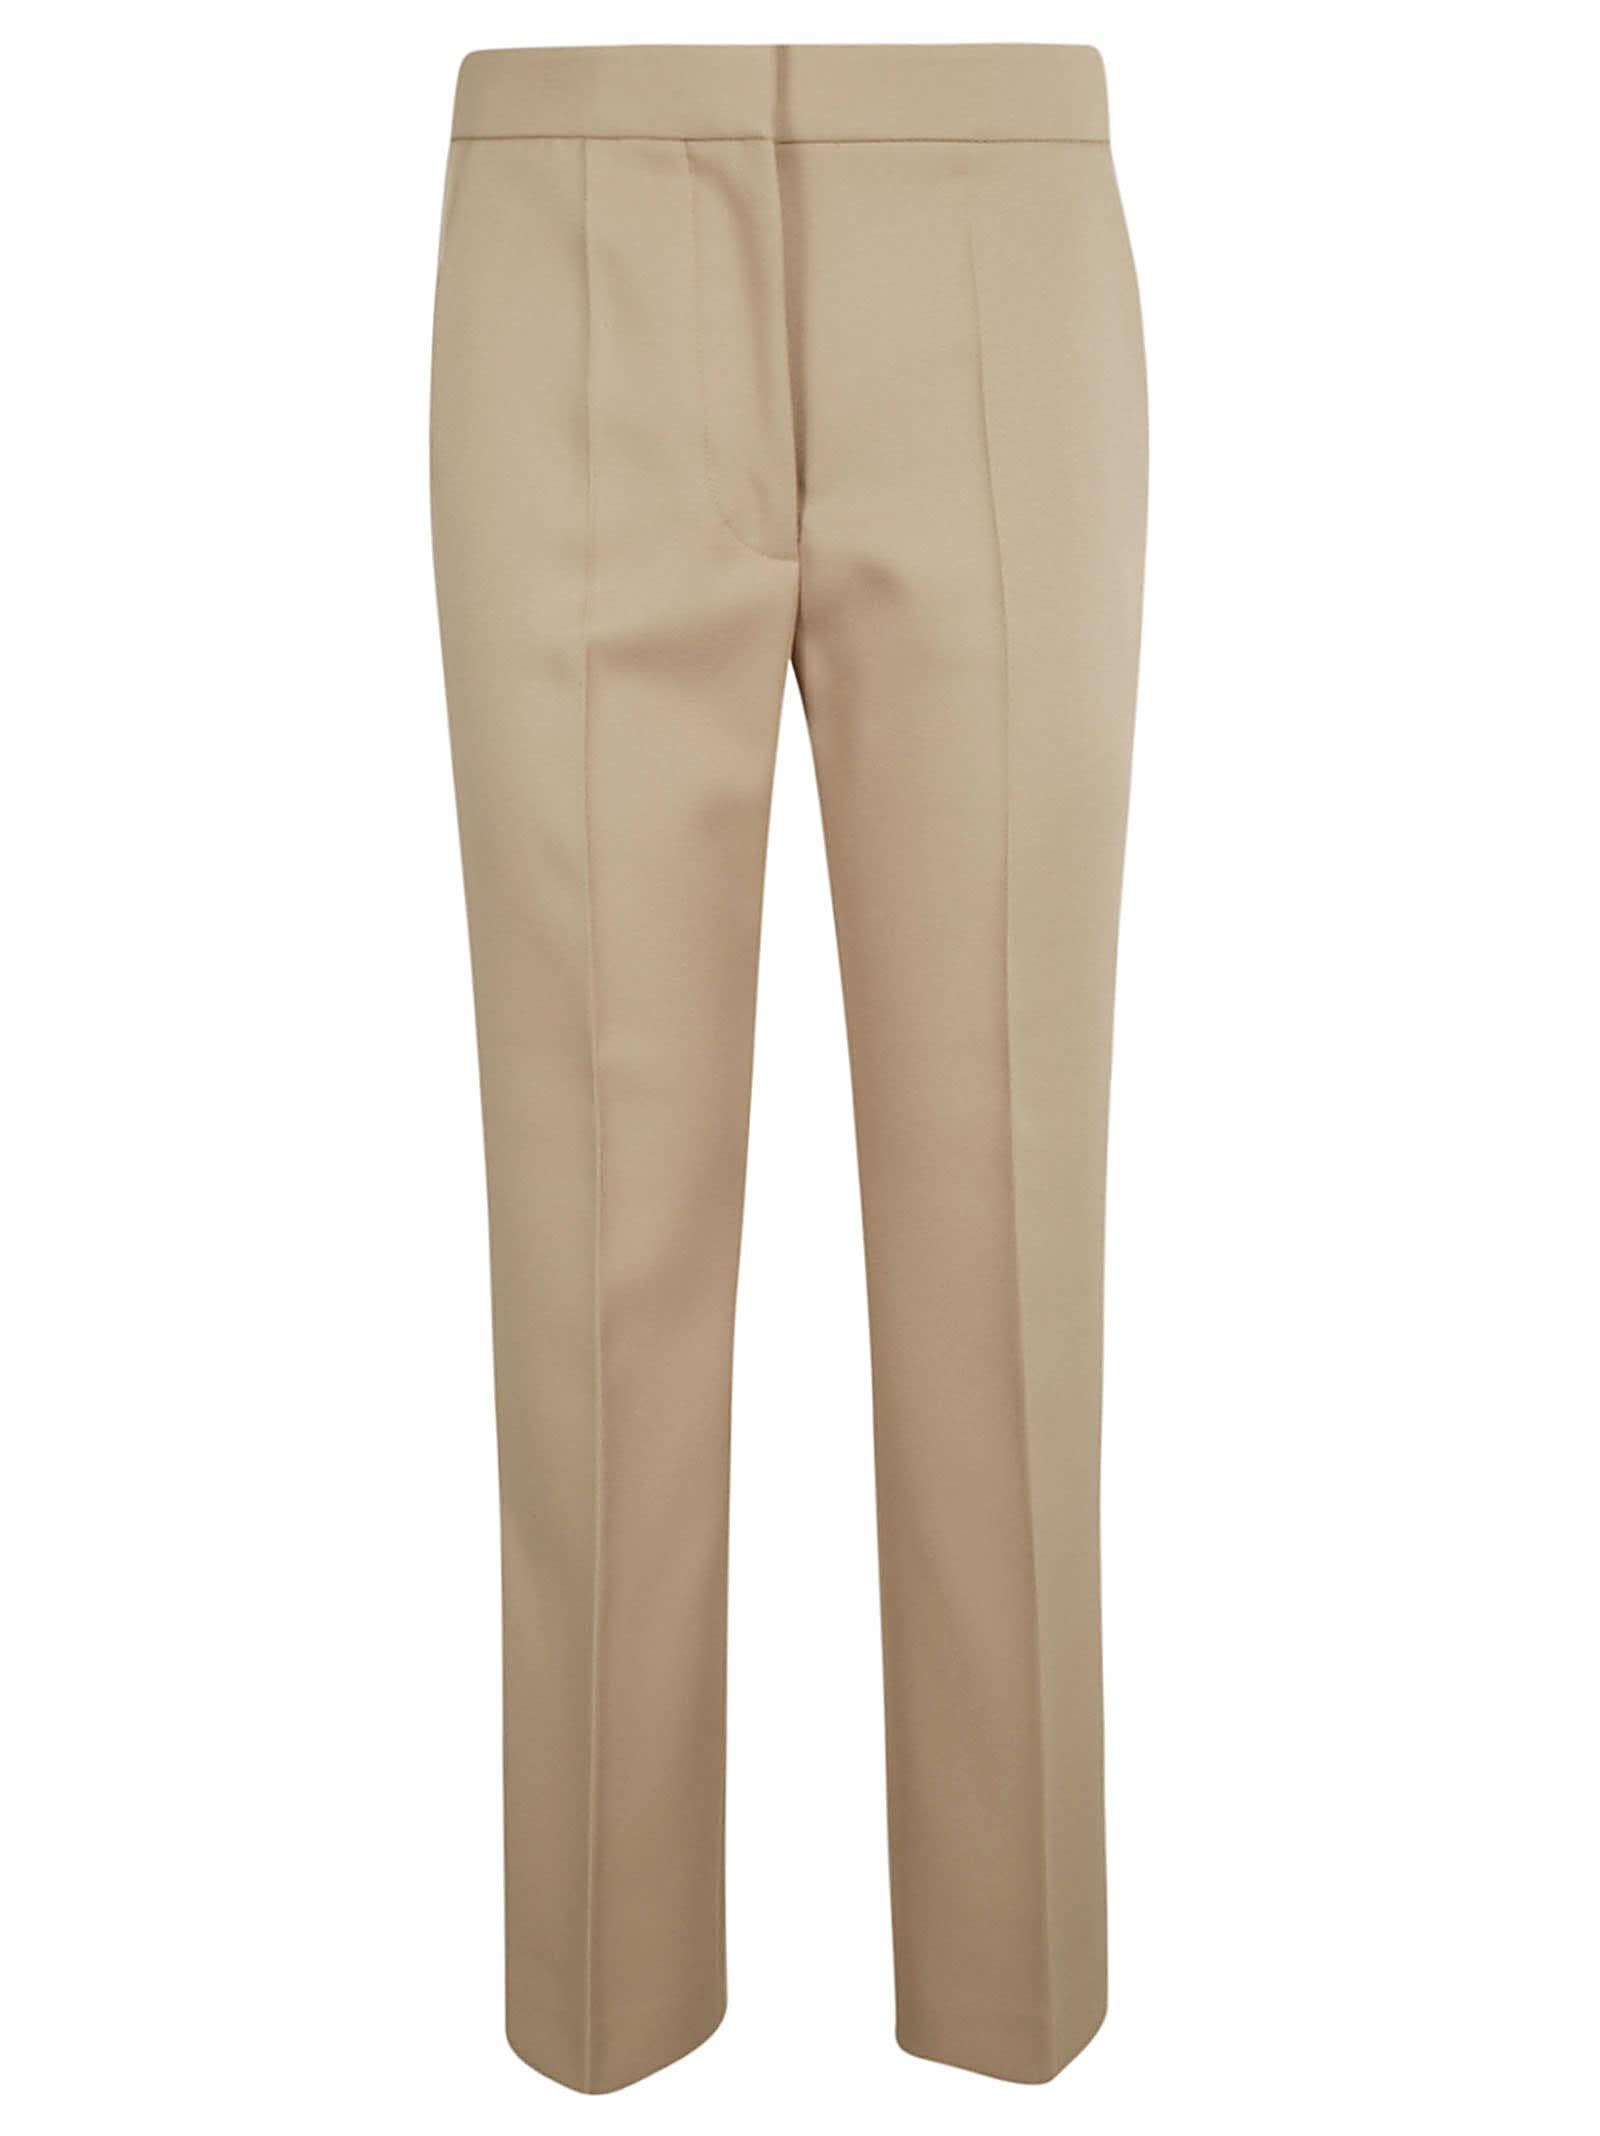 Stella McCartney Straight Trousers